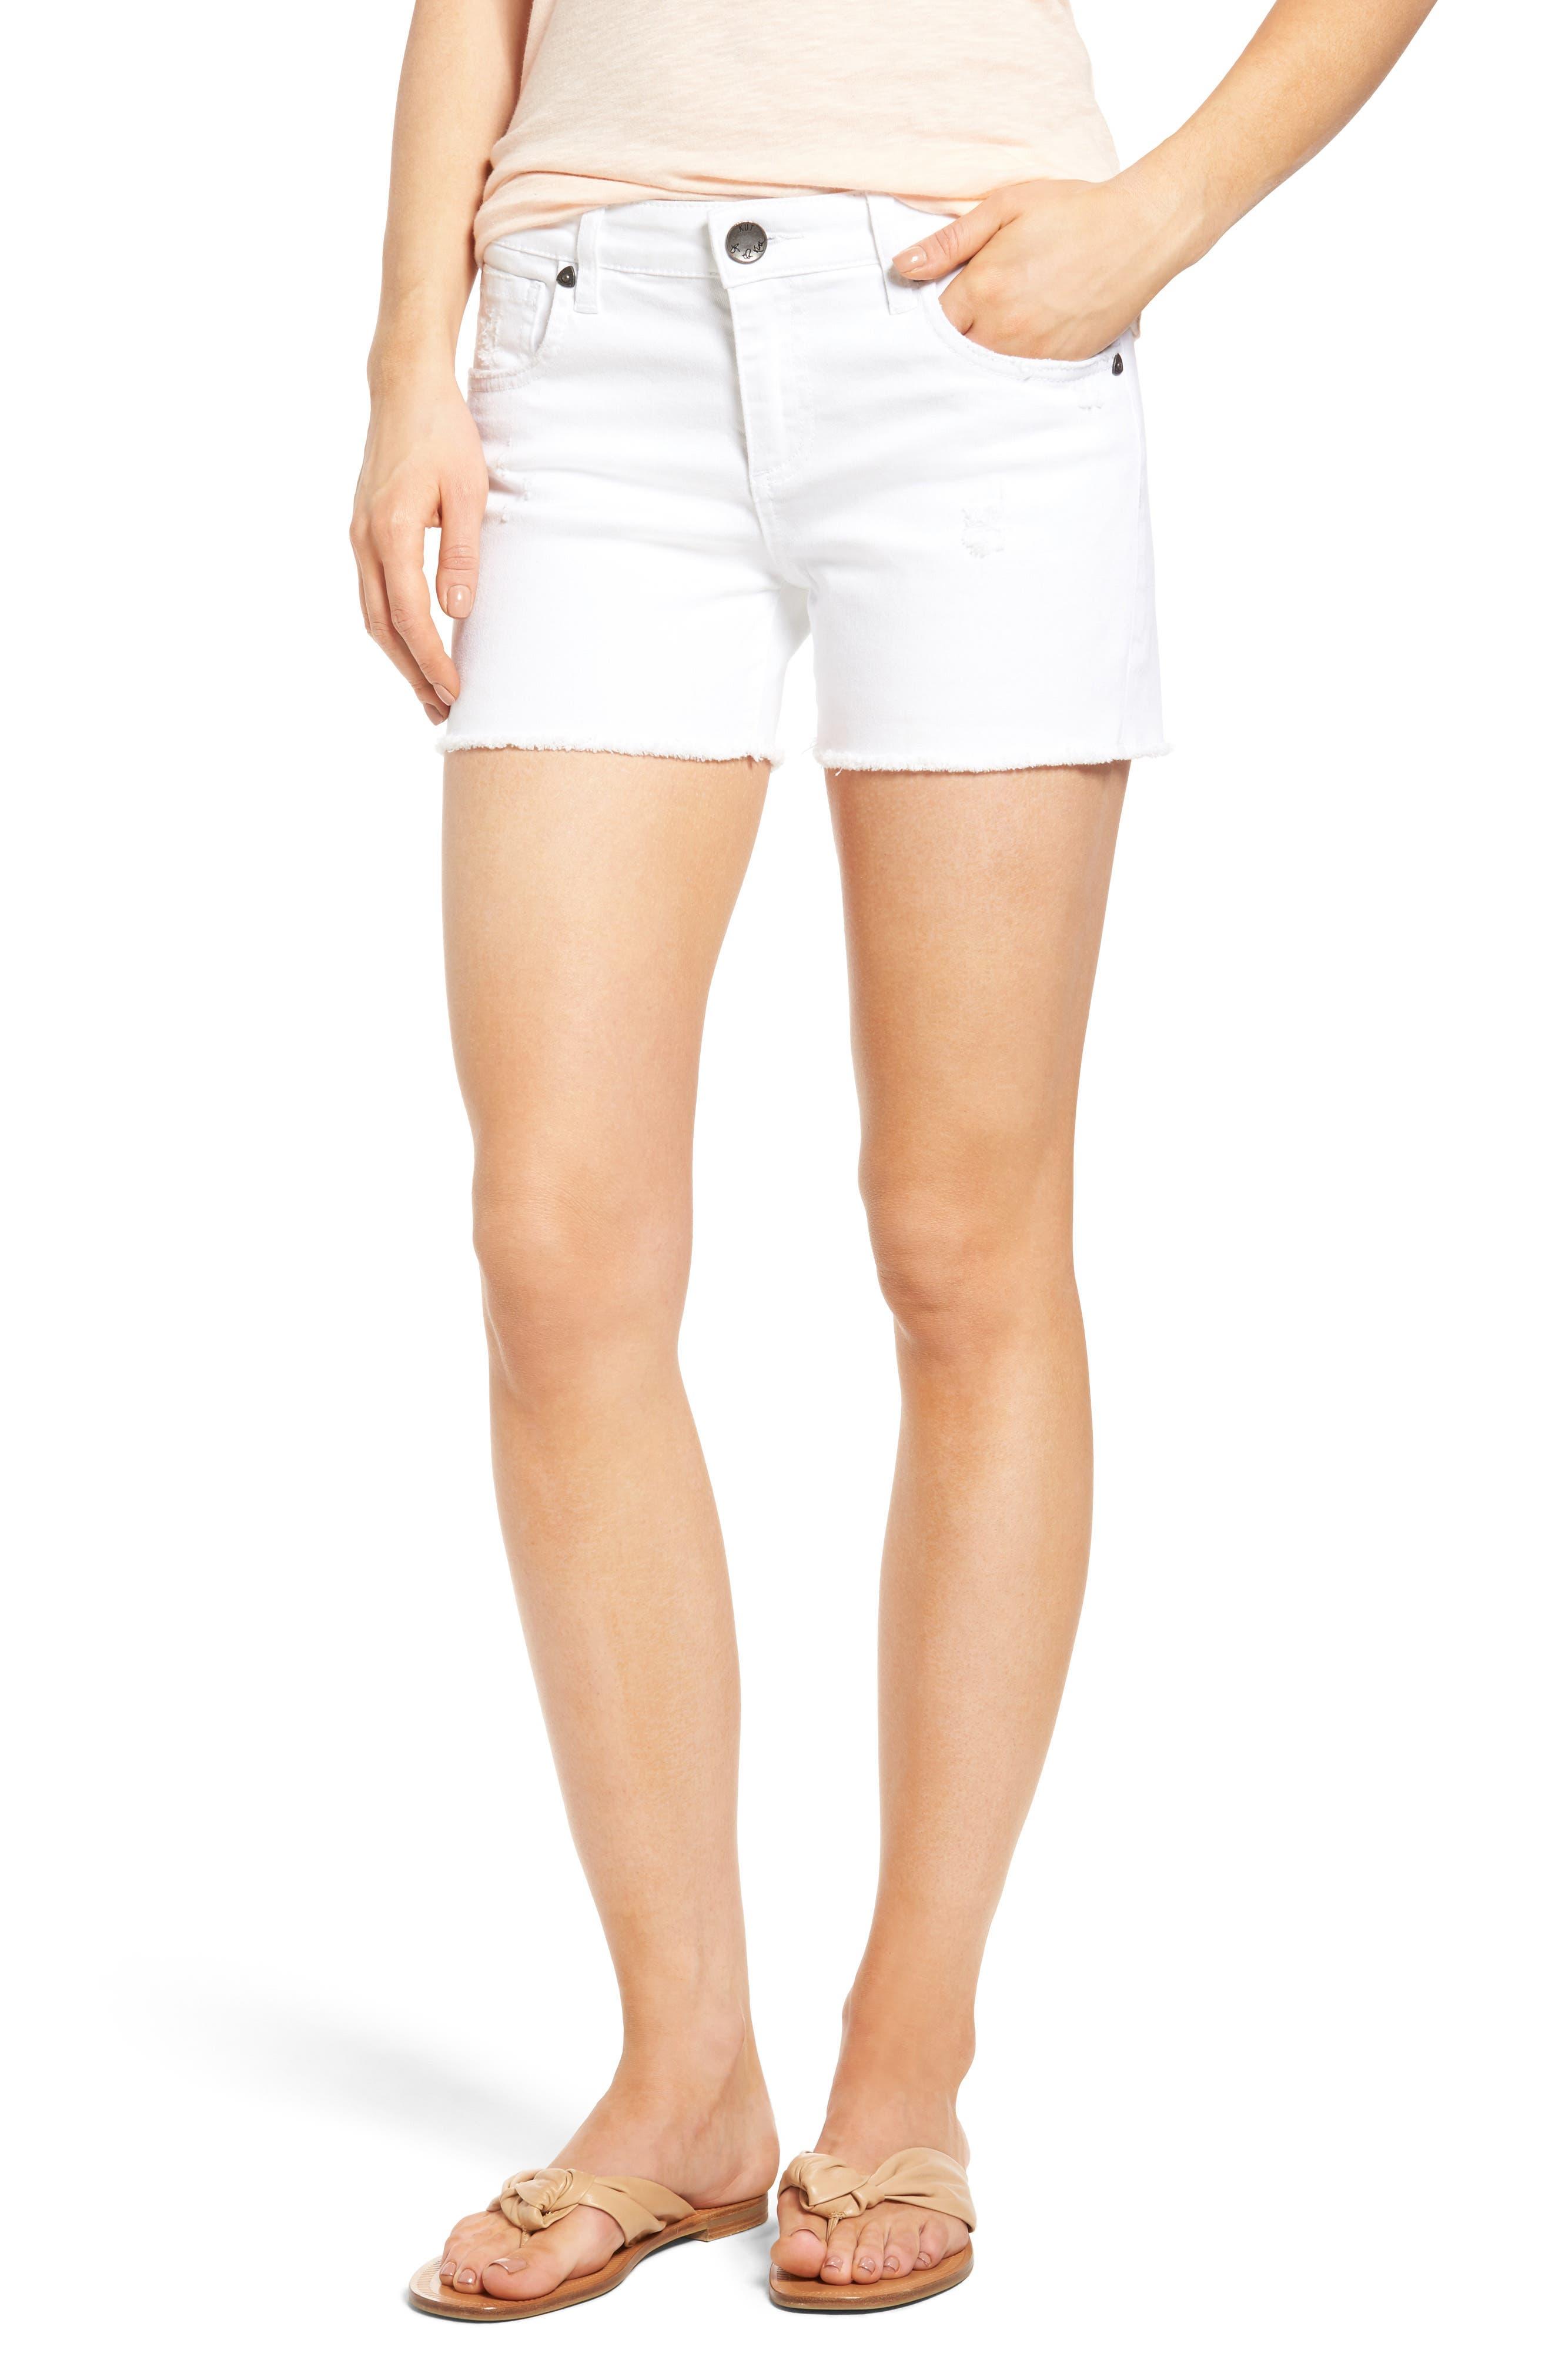 Gidget Denim Shorts,                             Main thumbnail 1, color,                             110